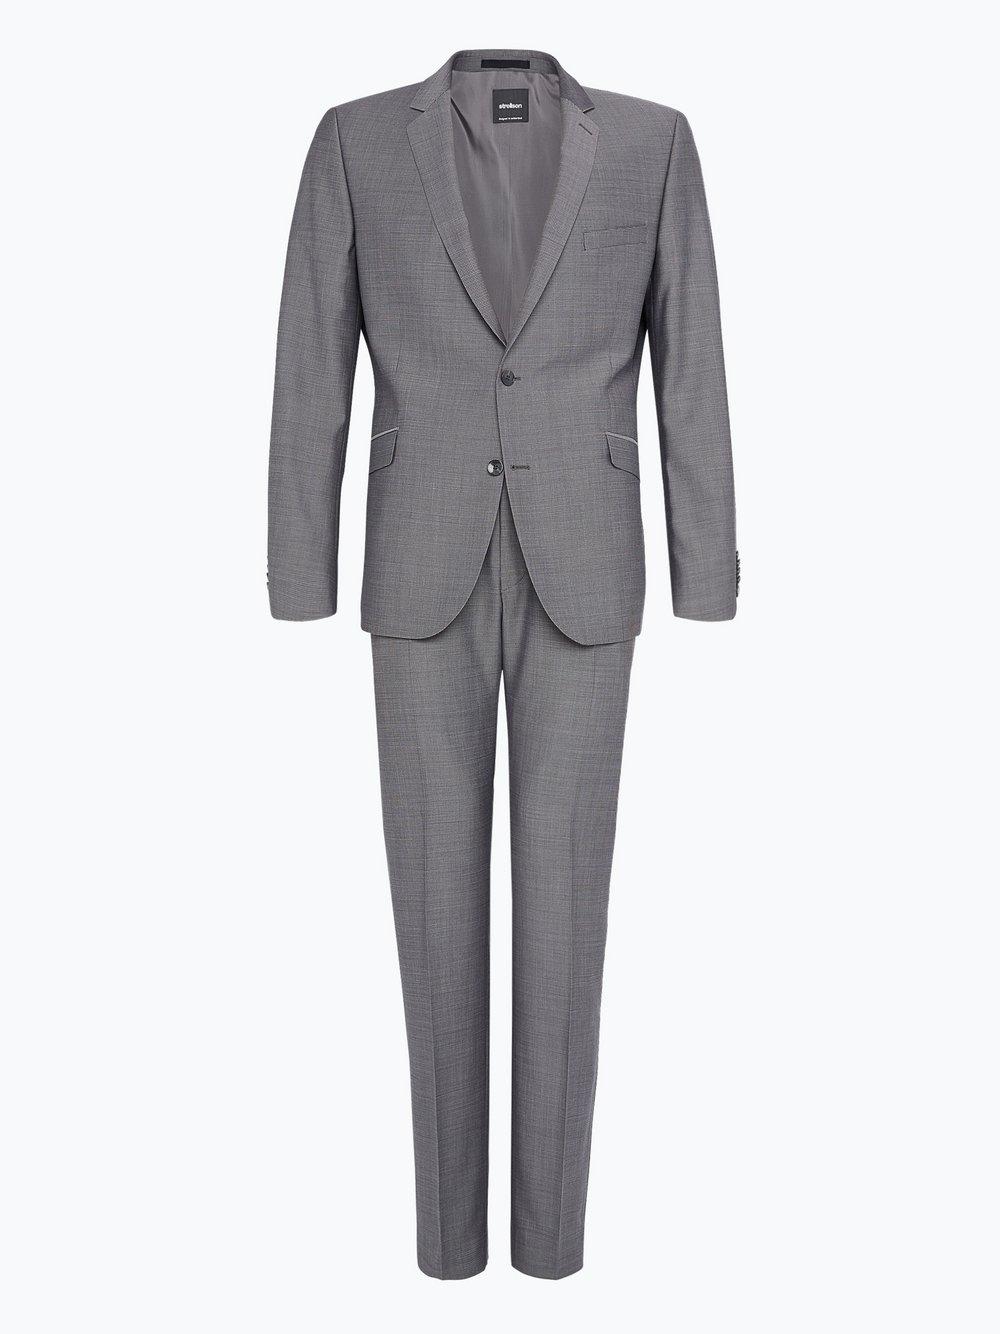 strellson herren anzug allen mercer online kaufen peek und  strellson herren anzug allen mercer 0